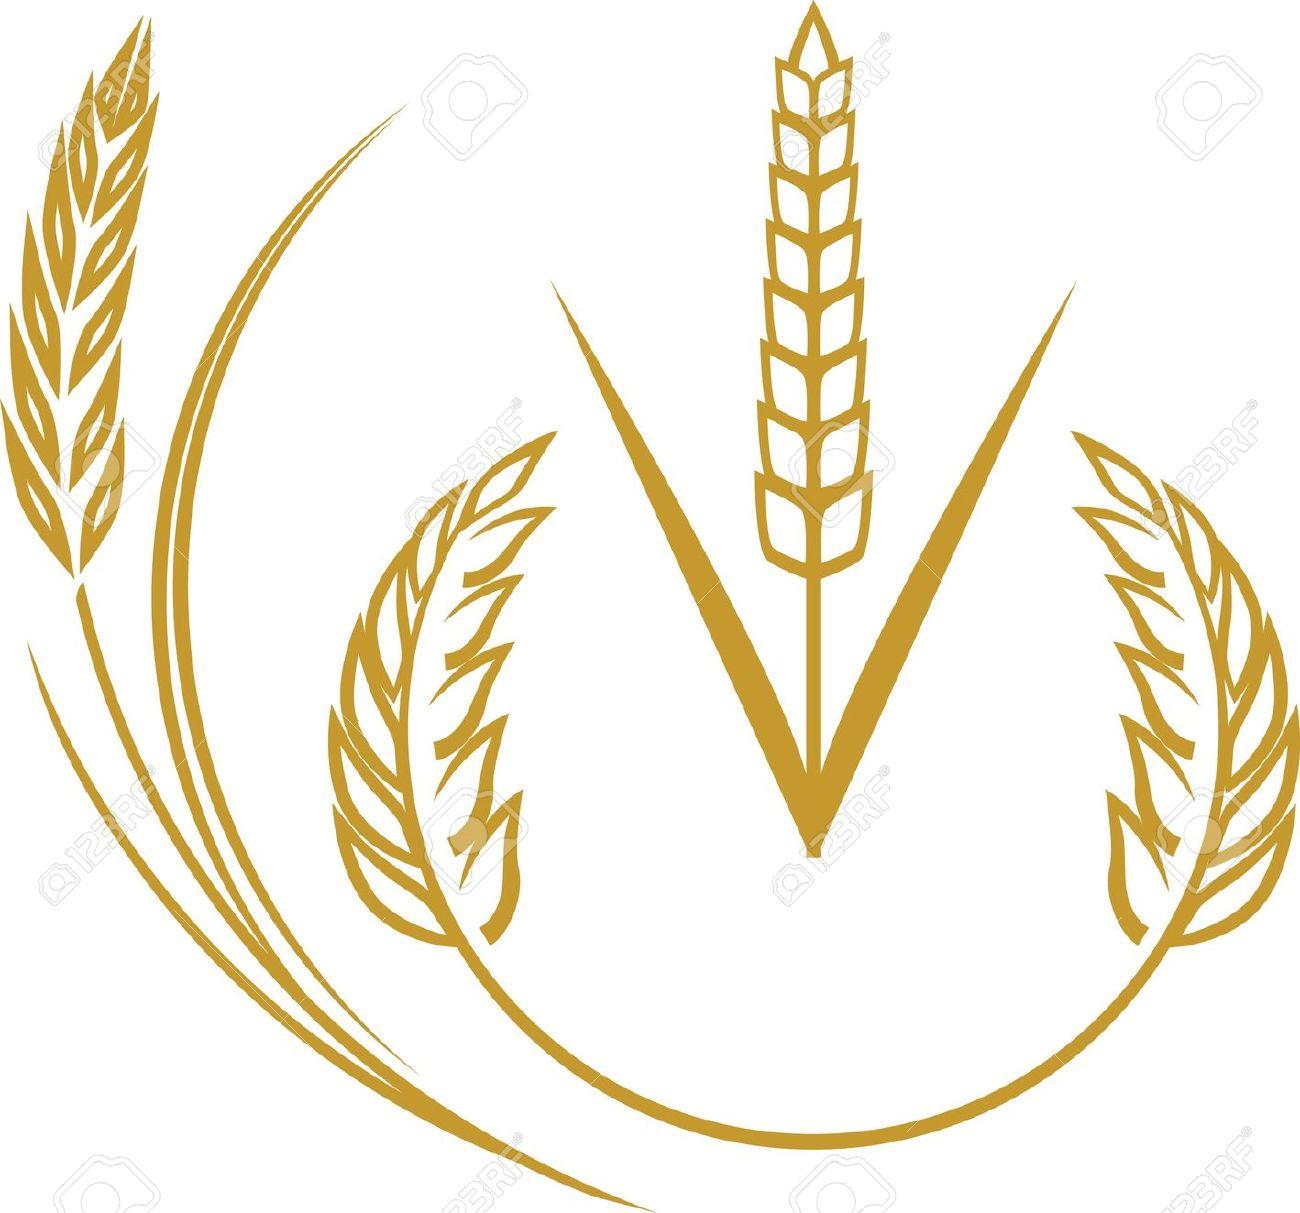 Grain harvest clipart - Clipground